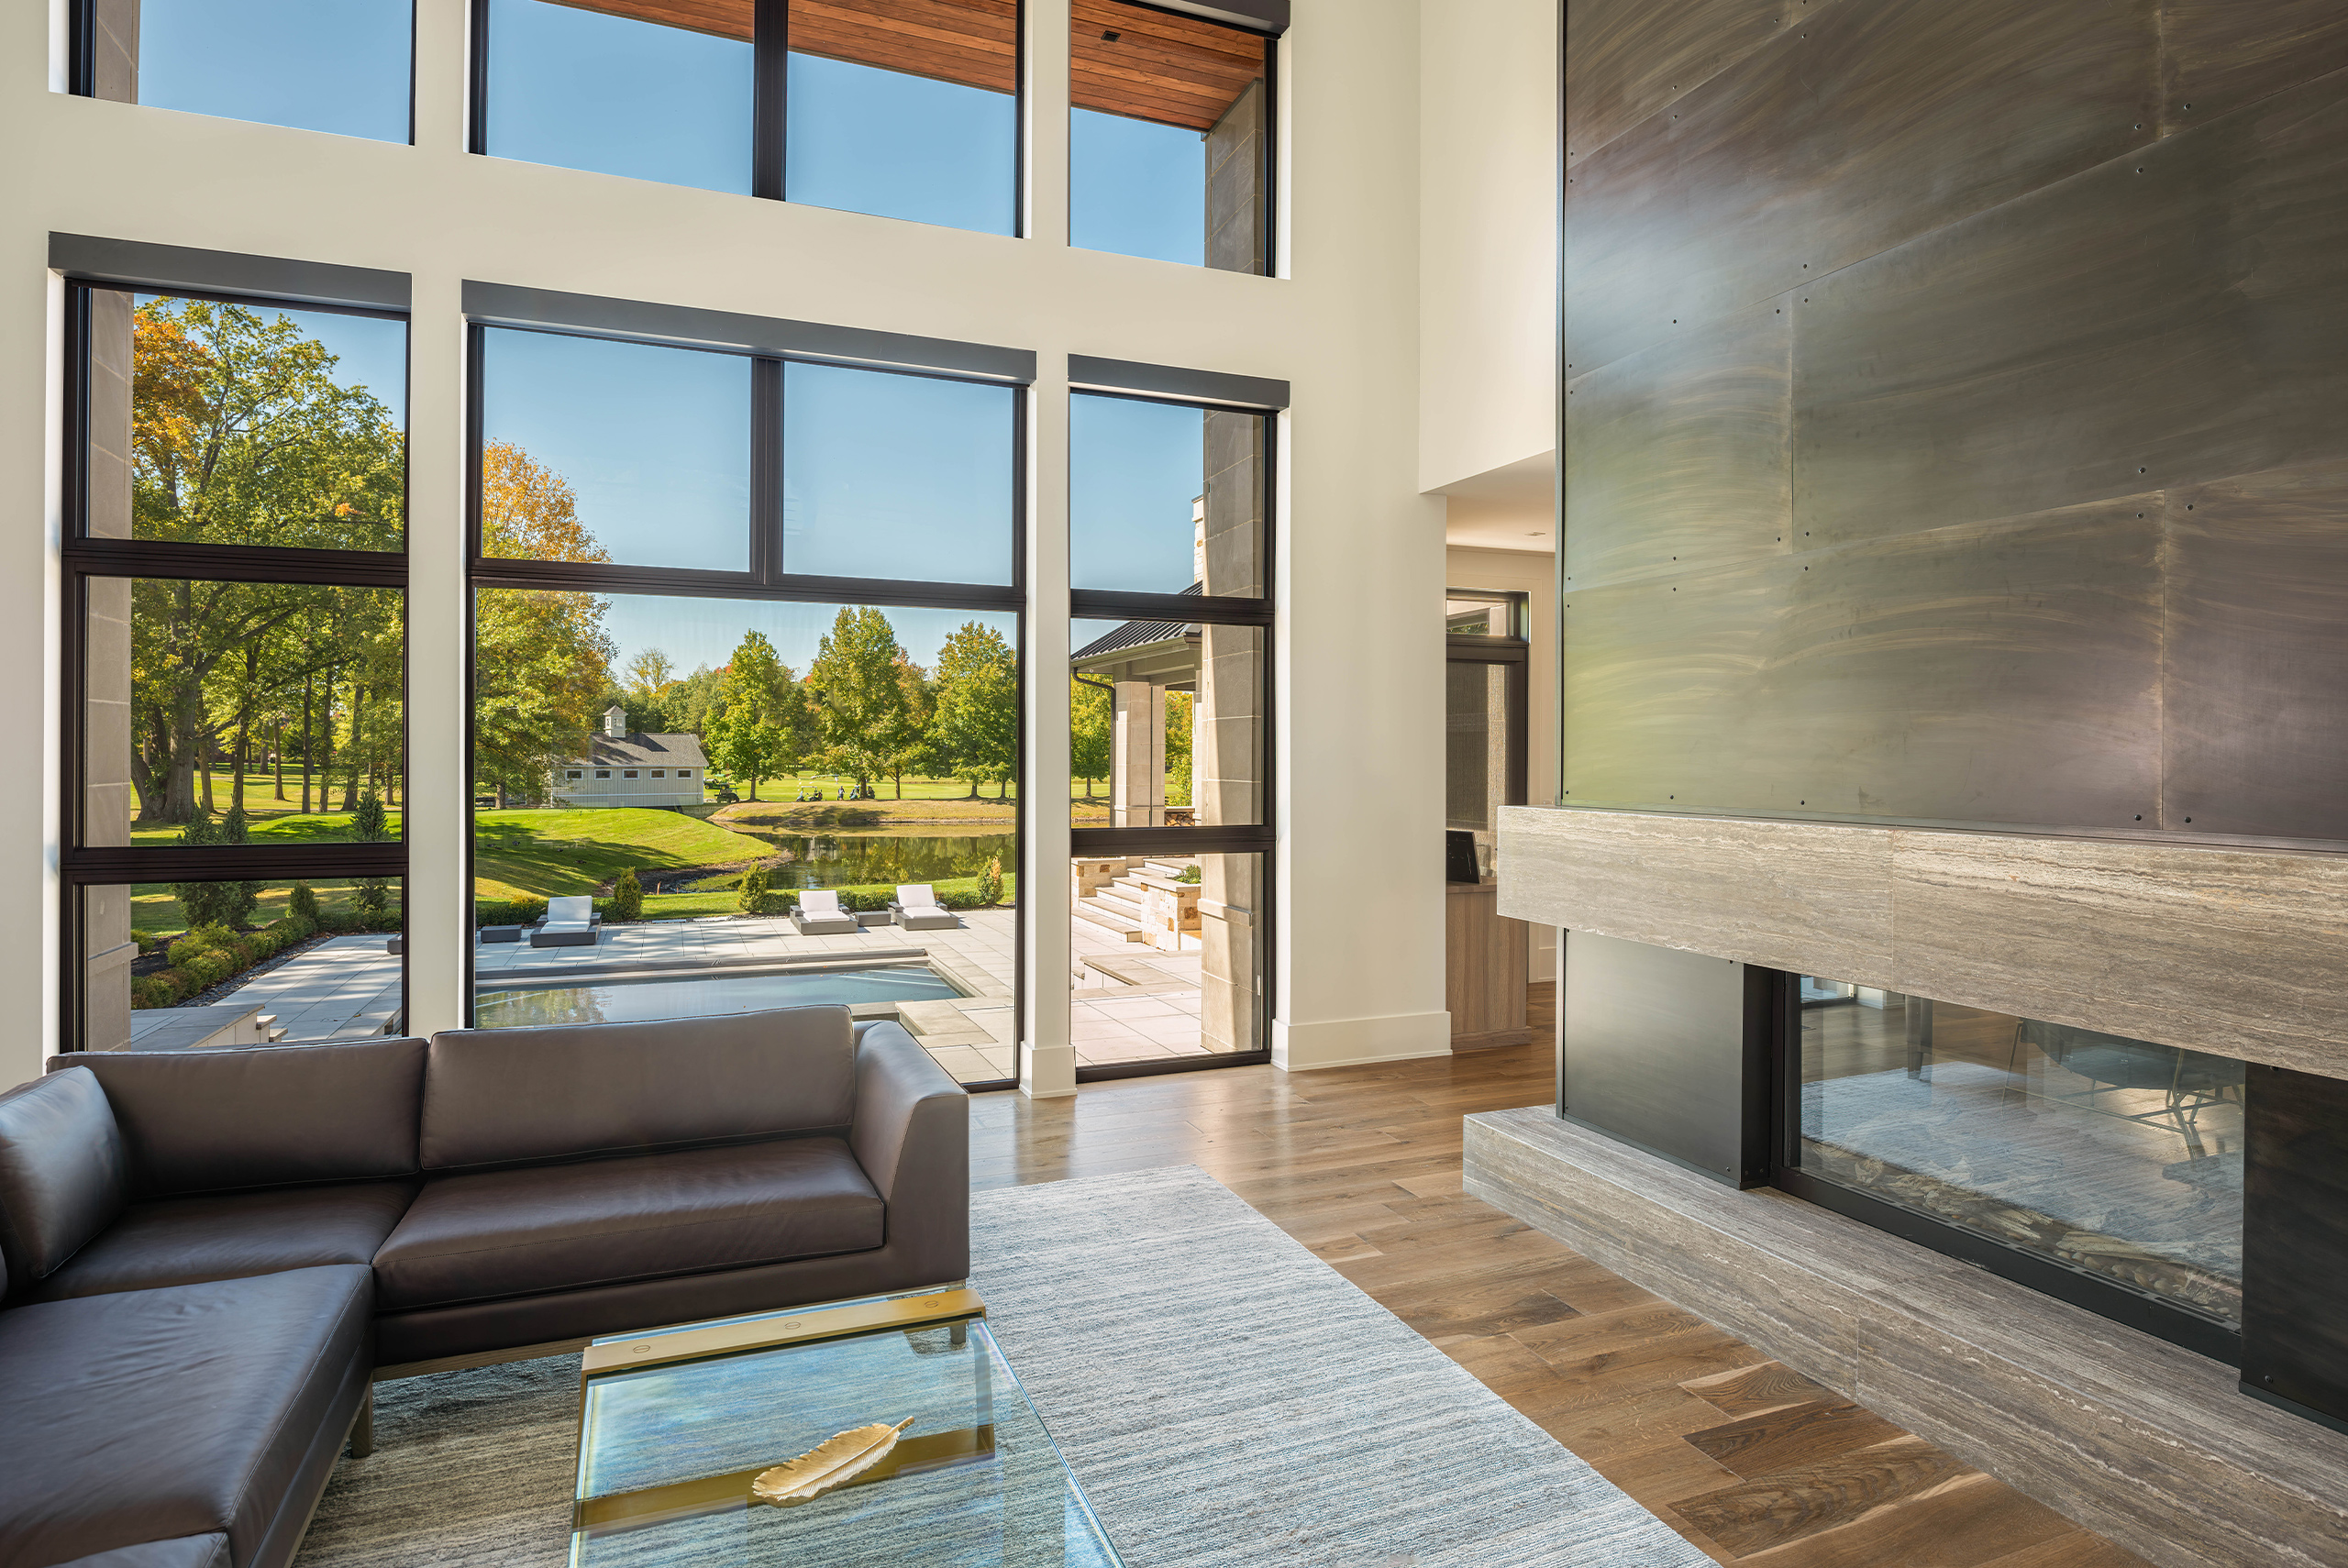 Carmel, Indianapolis, USA – Private Villa - Oikos